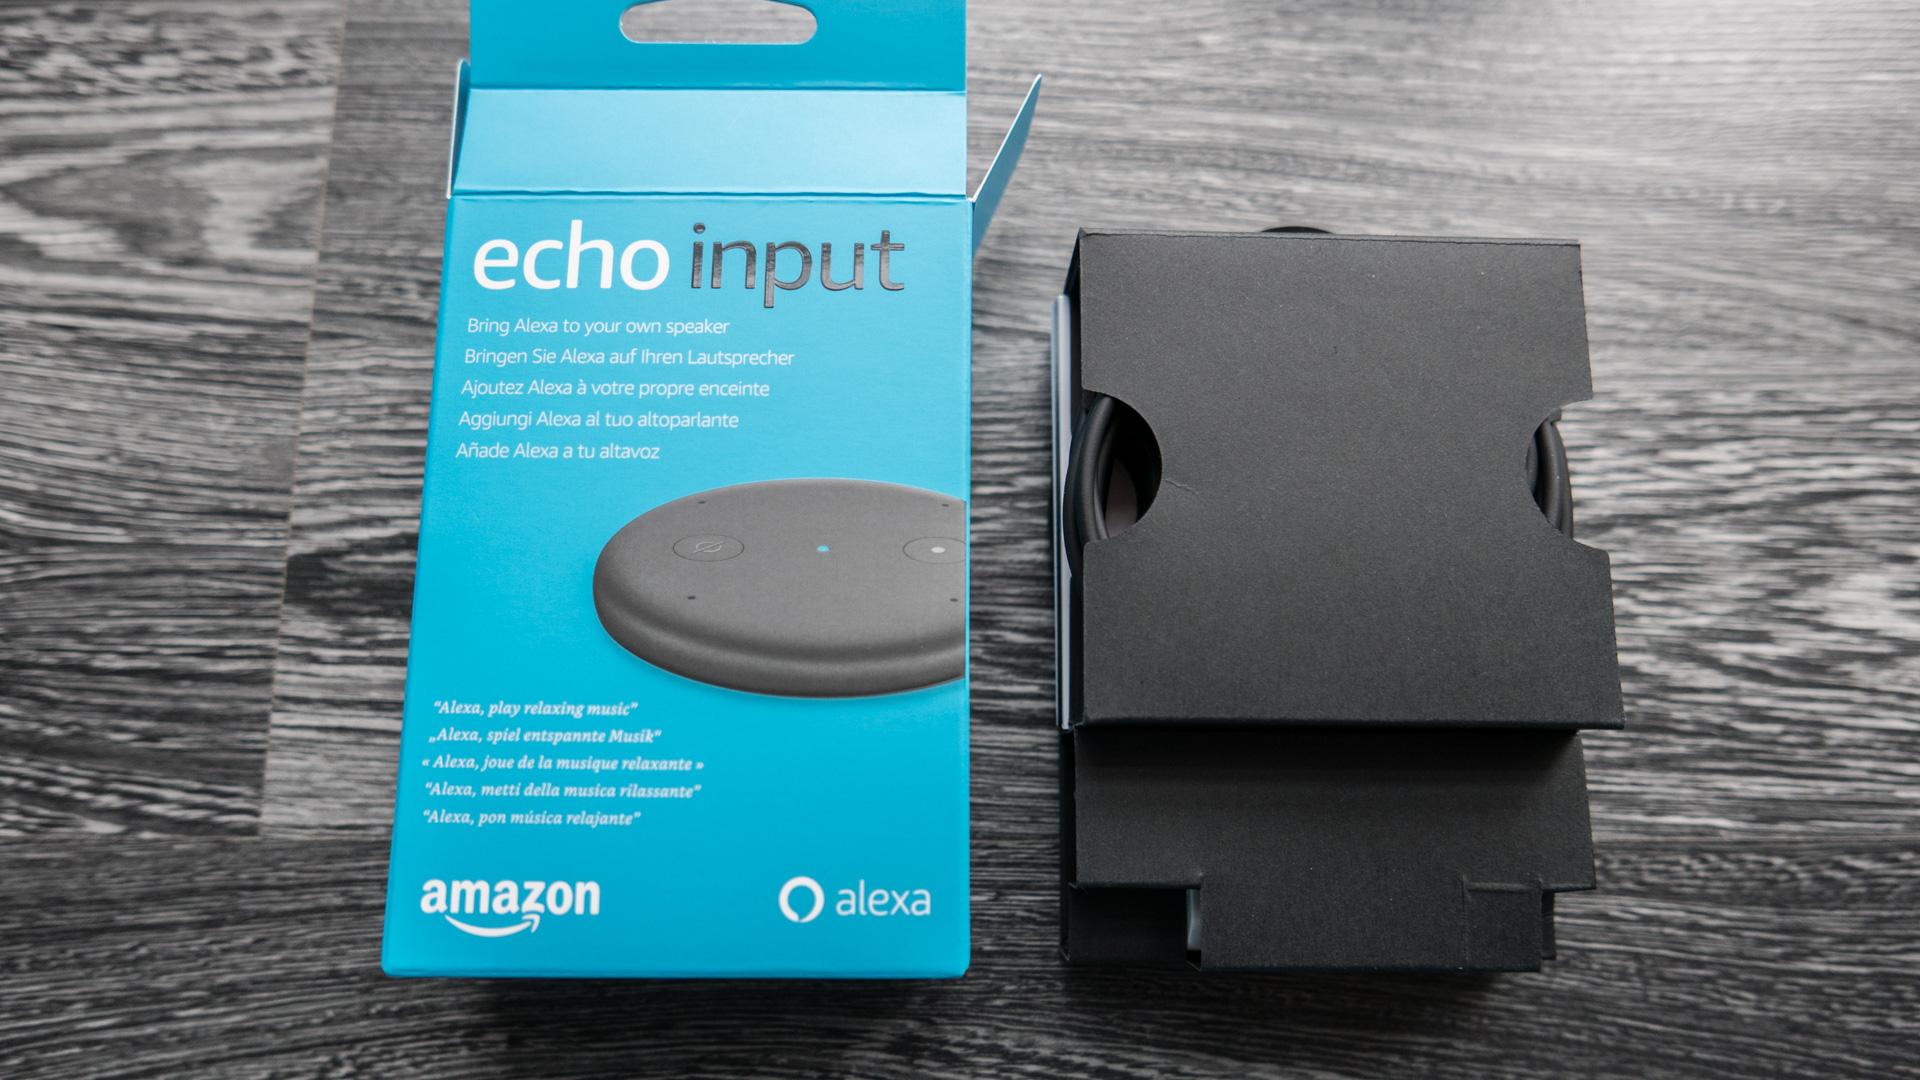 Amazon-Echo-Input-Details-5